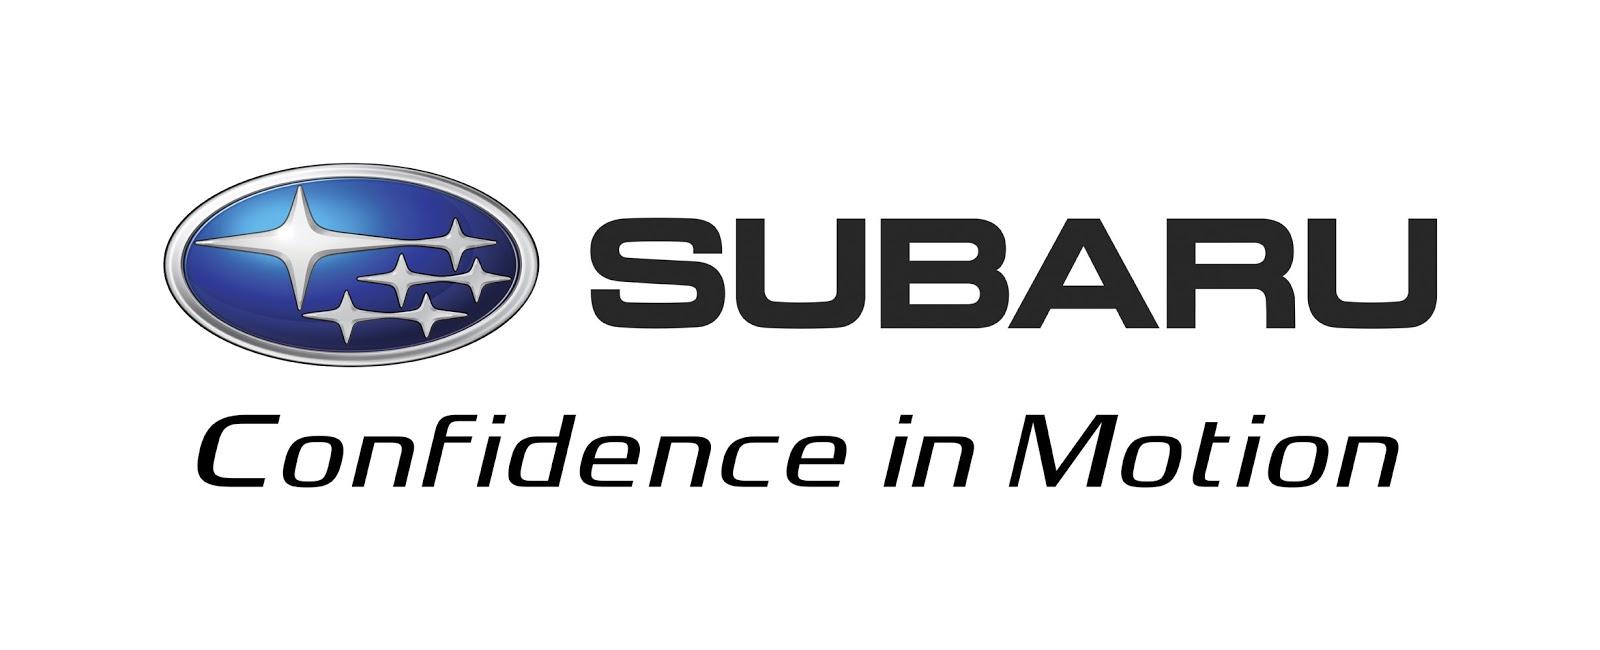 Subaru Again Named Most Trusted Brand